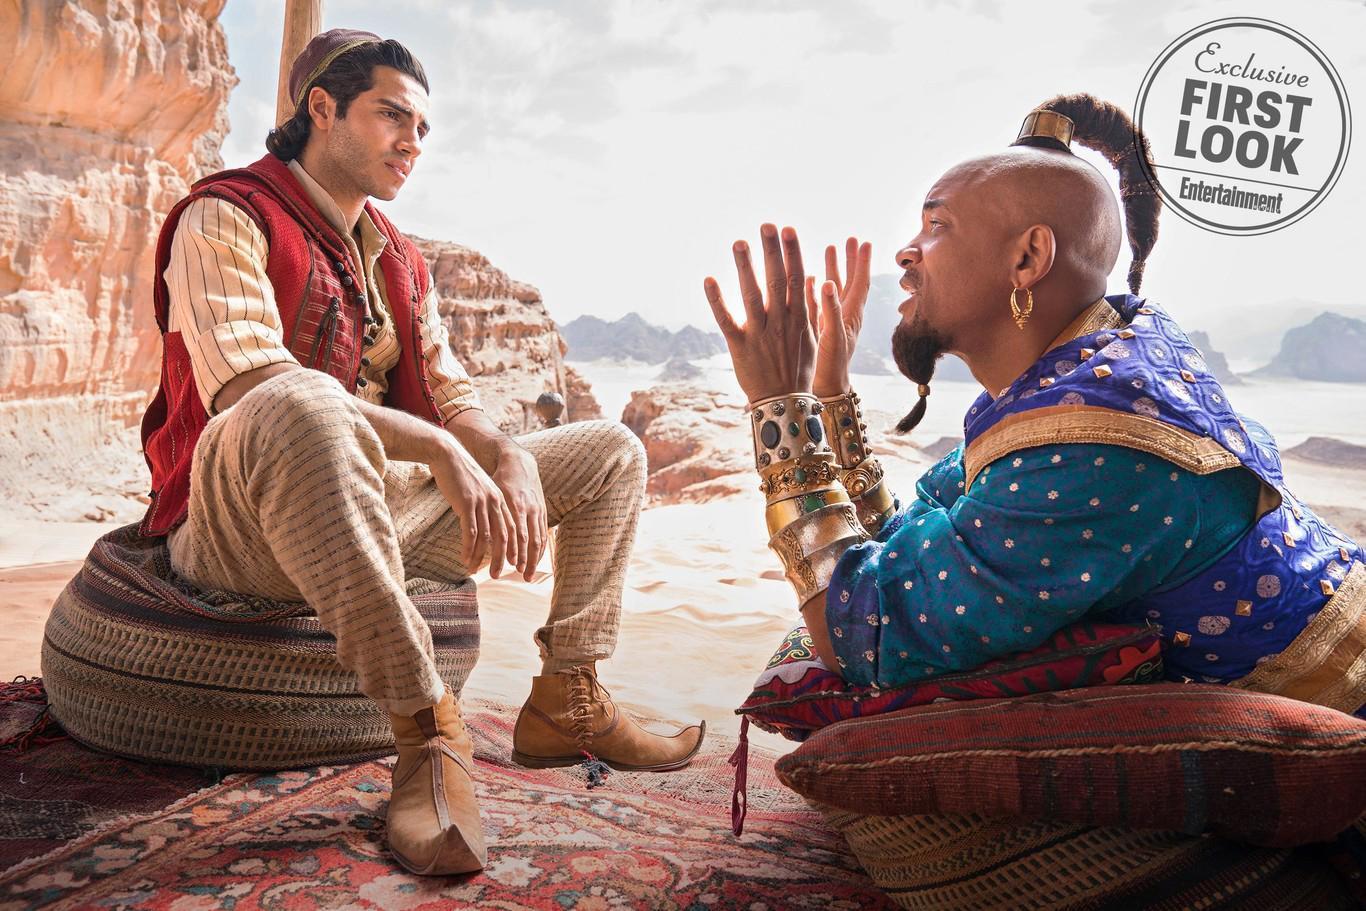 Aladdin 2019 pelicula completa